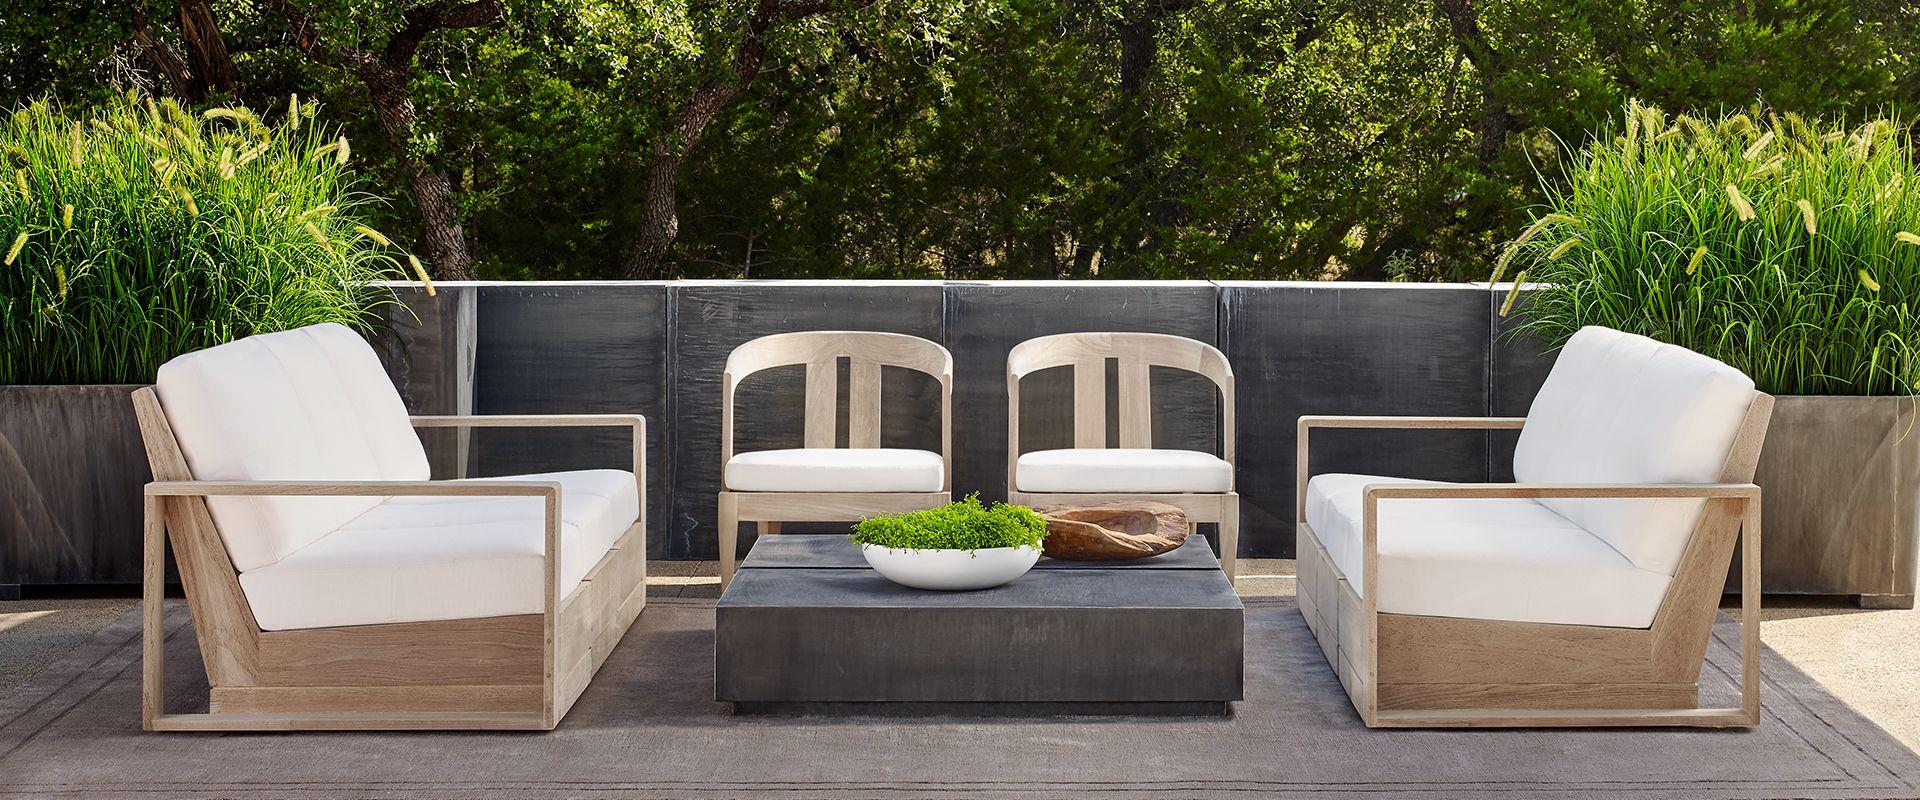 Wonderful Sutherland Furniture   Luxury Outdoor Furniture And Indoor Accessories